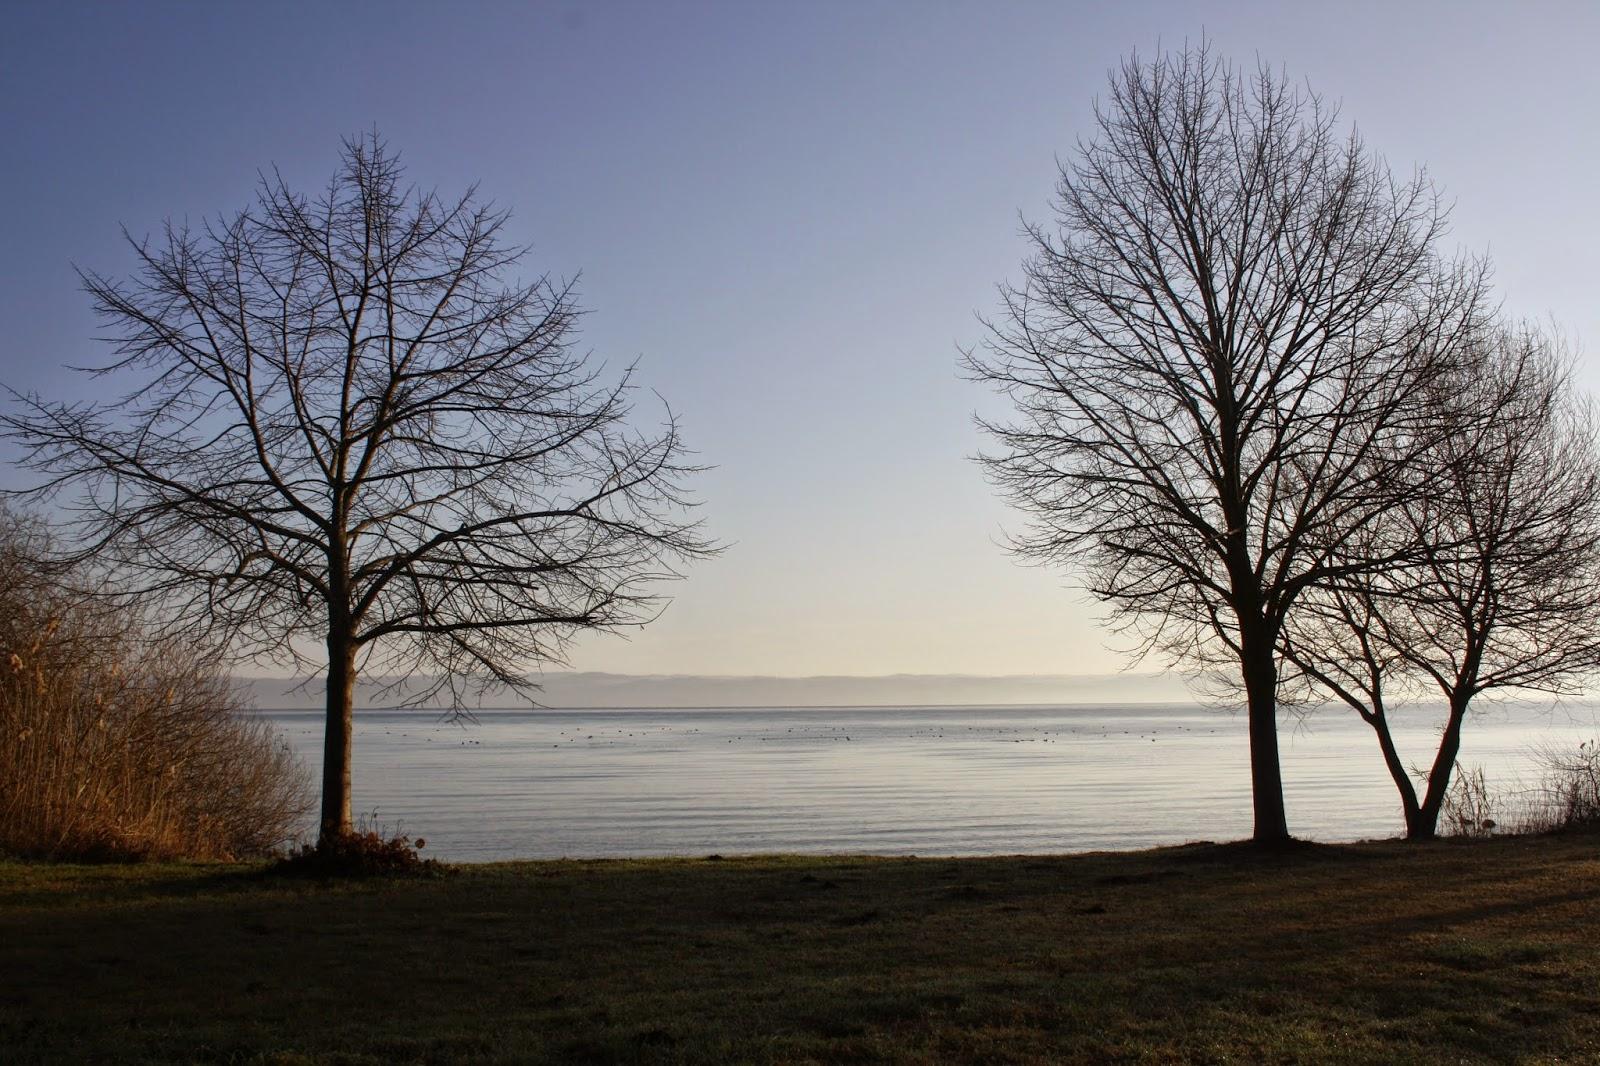 Vista del Lago di Bolsena